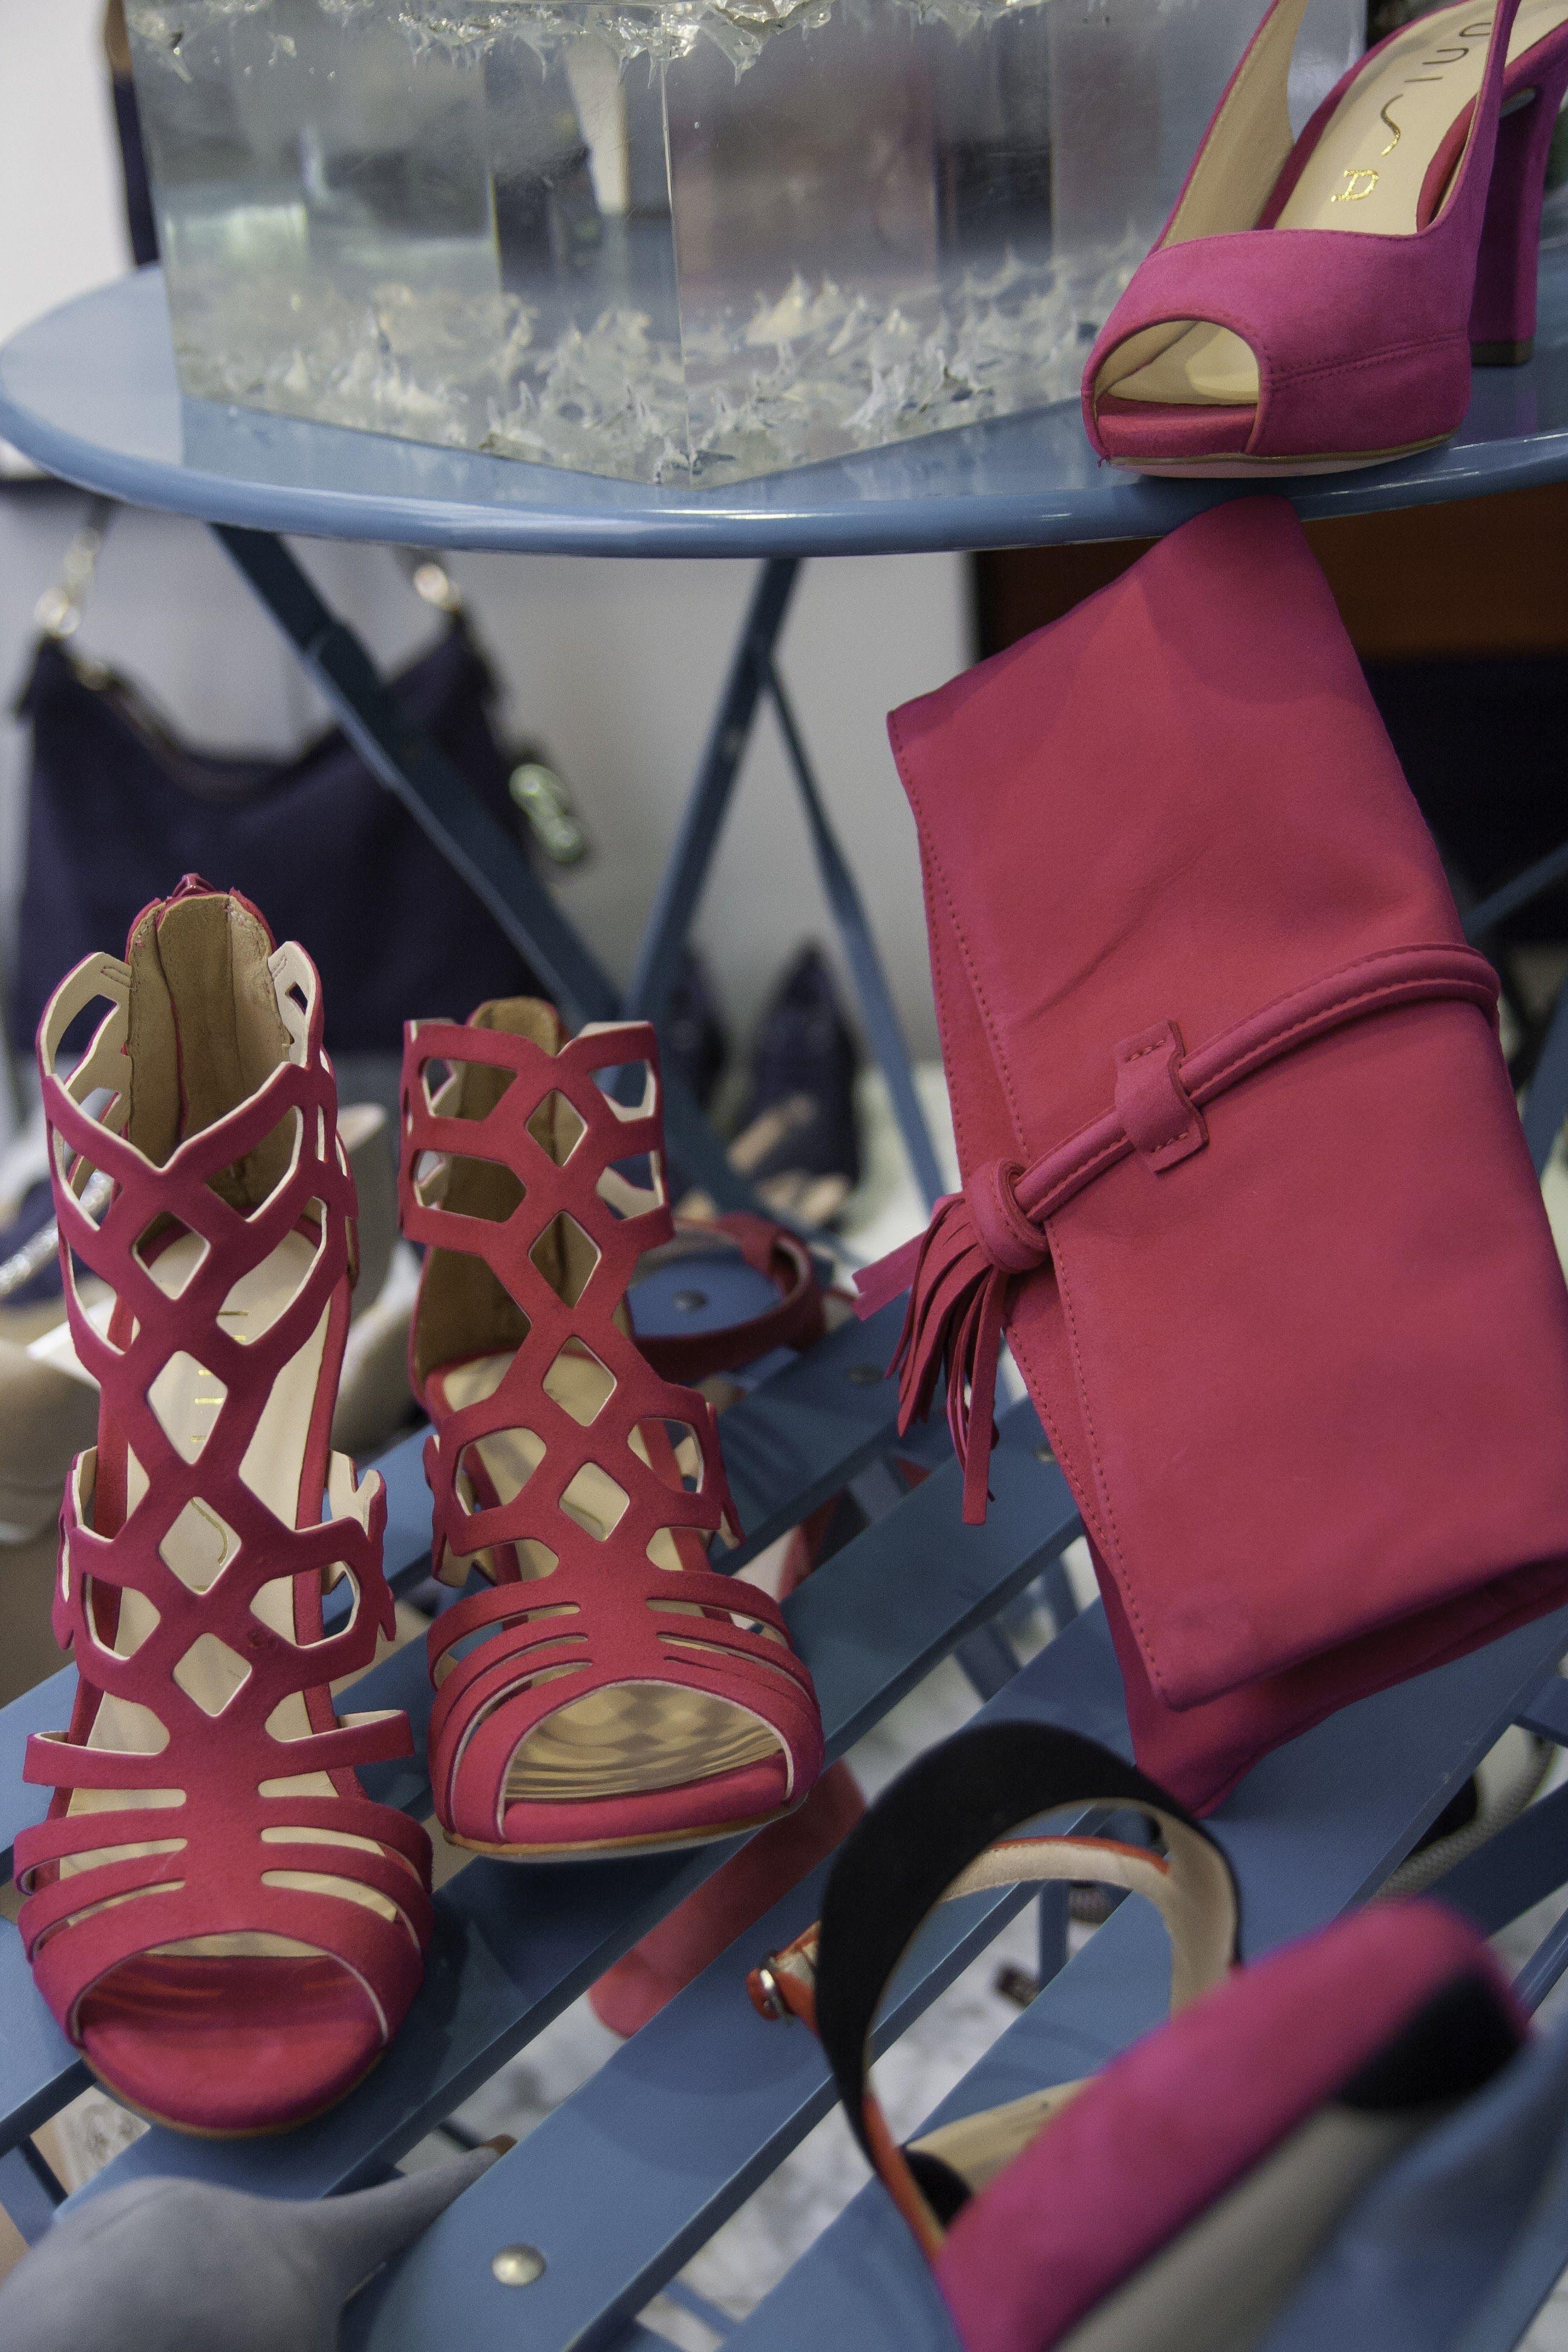 Foto 10 de Calzado para mujer en  | Calzados Prietos